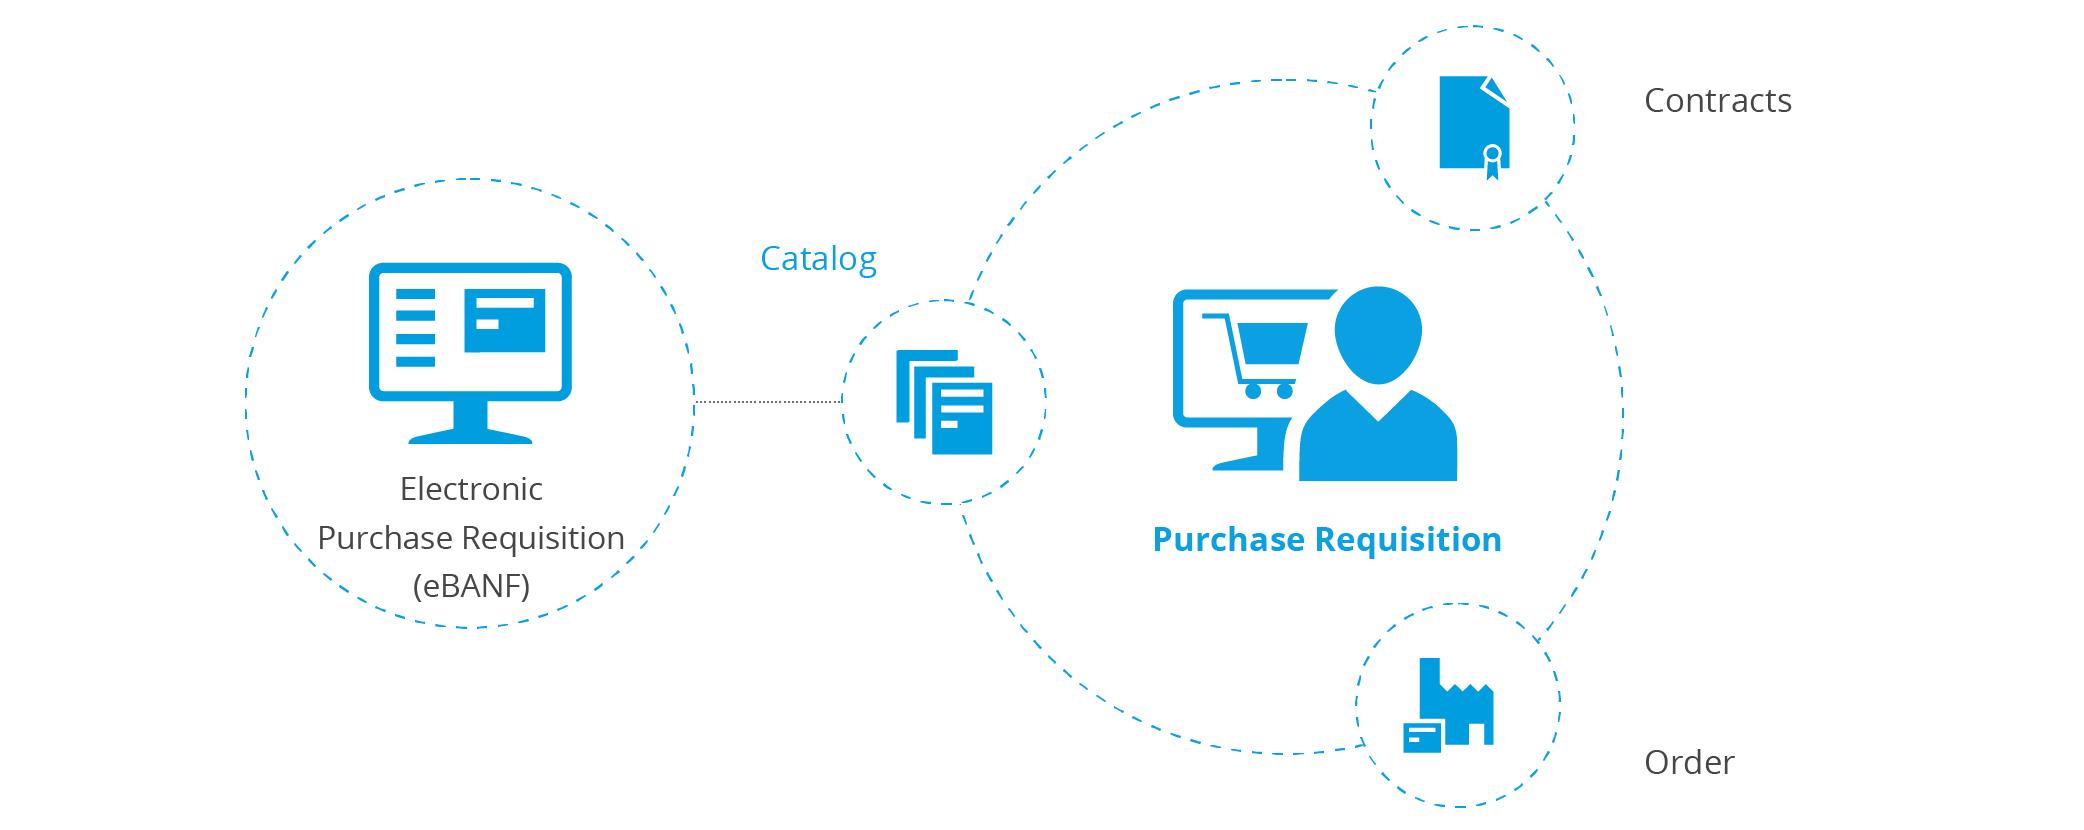 Procurement process - electronic purchase requisition